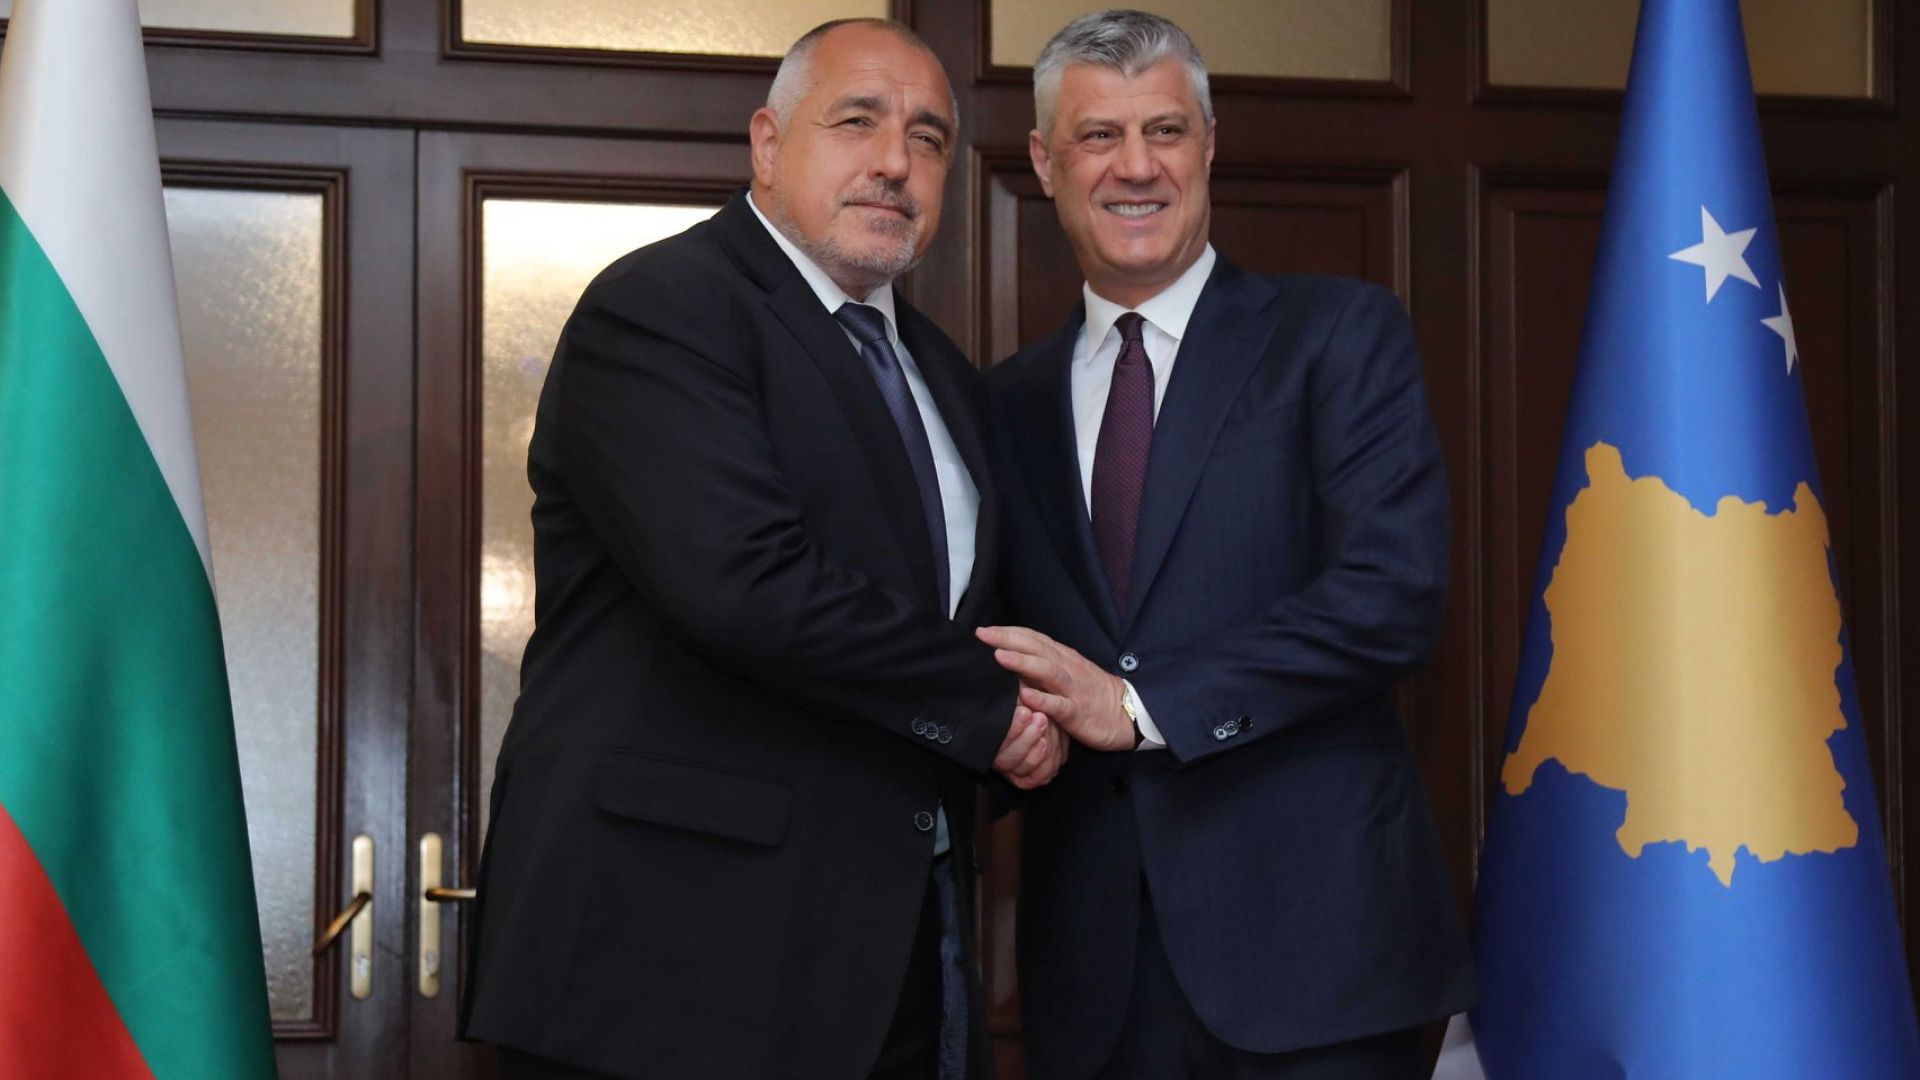 Борисов прие медал за свободата и независимостта на Косово